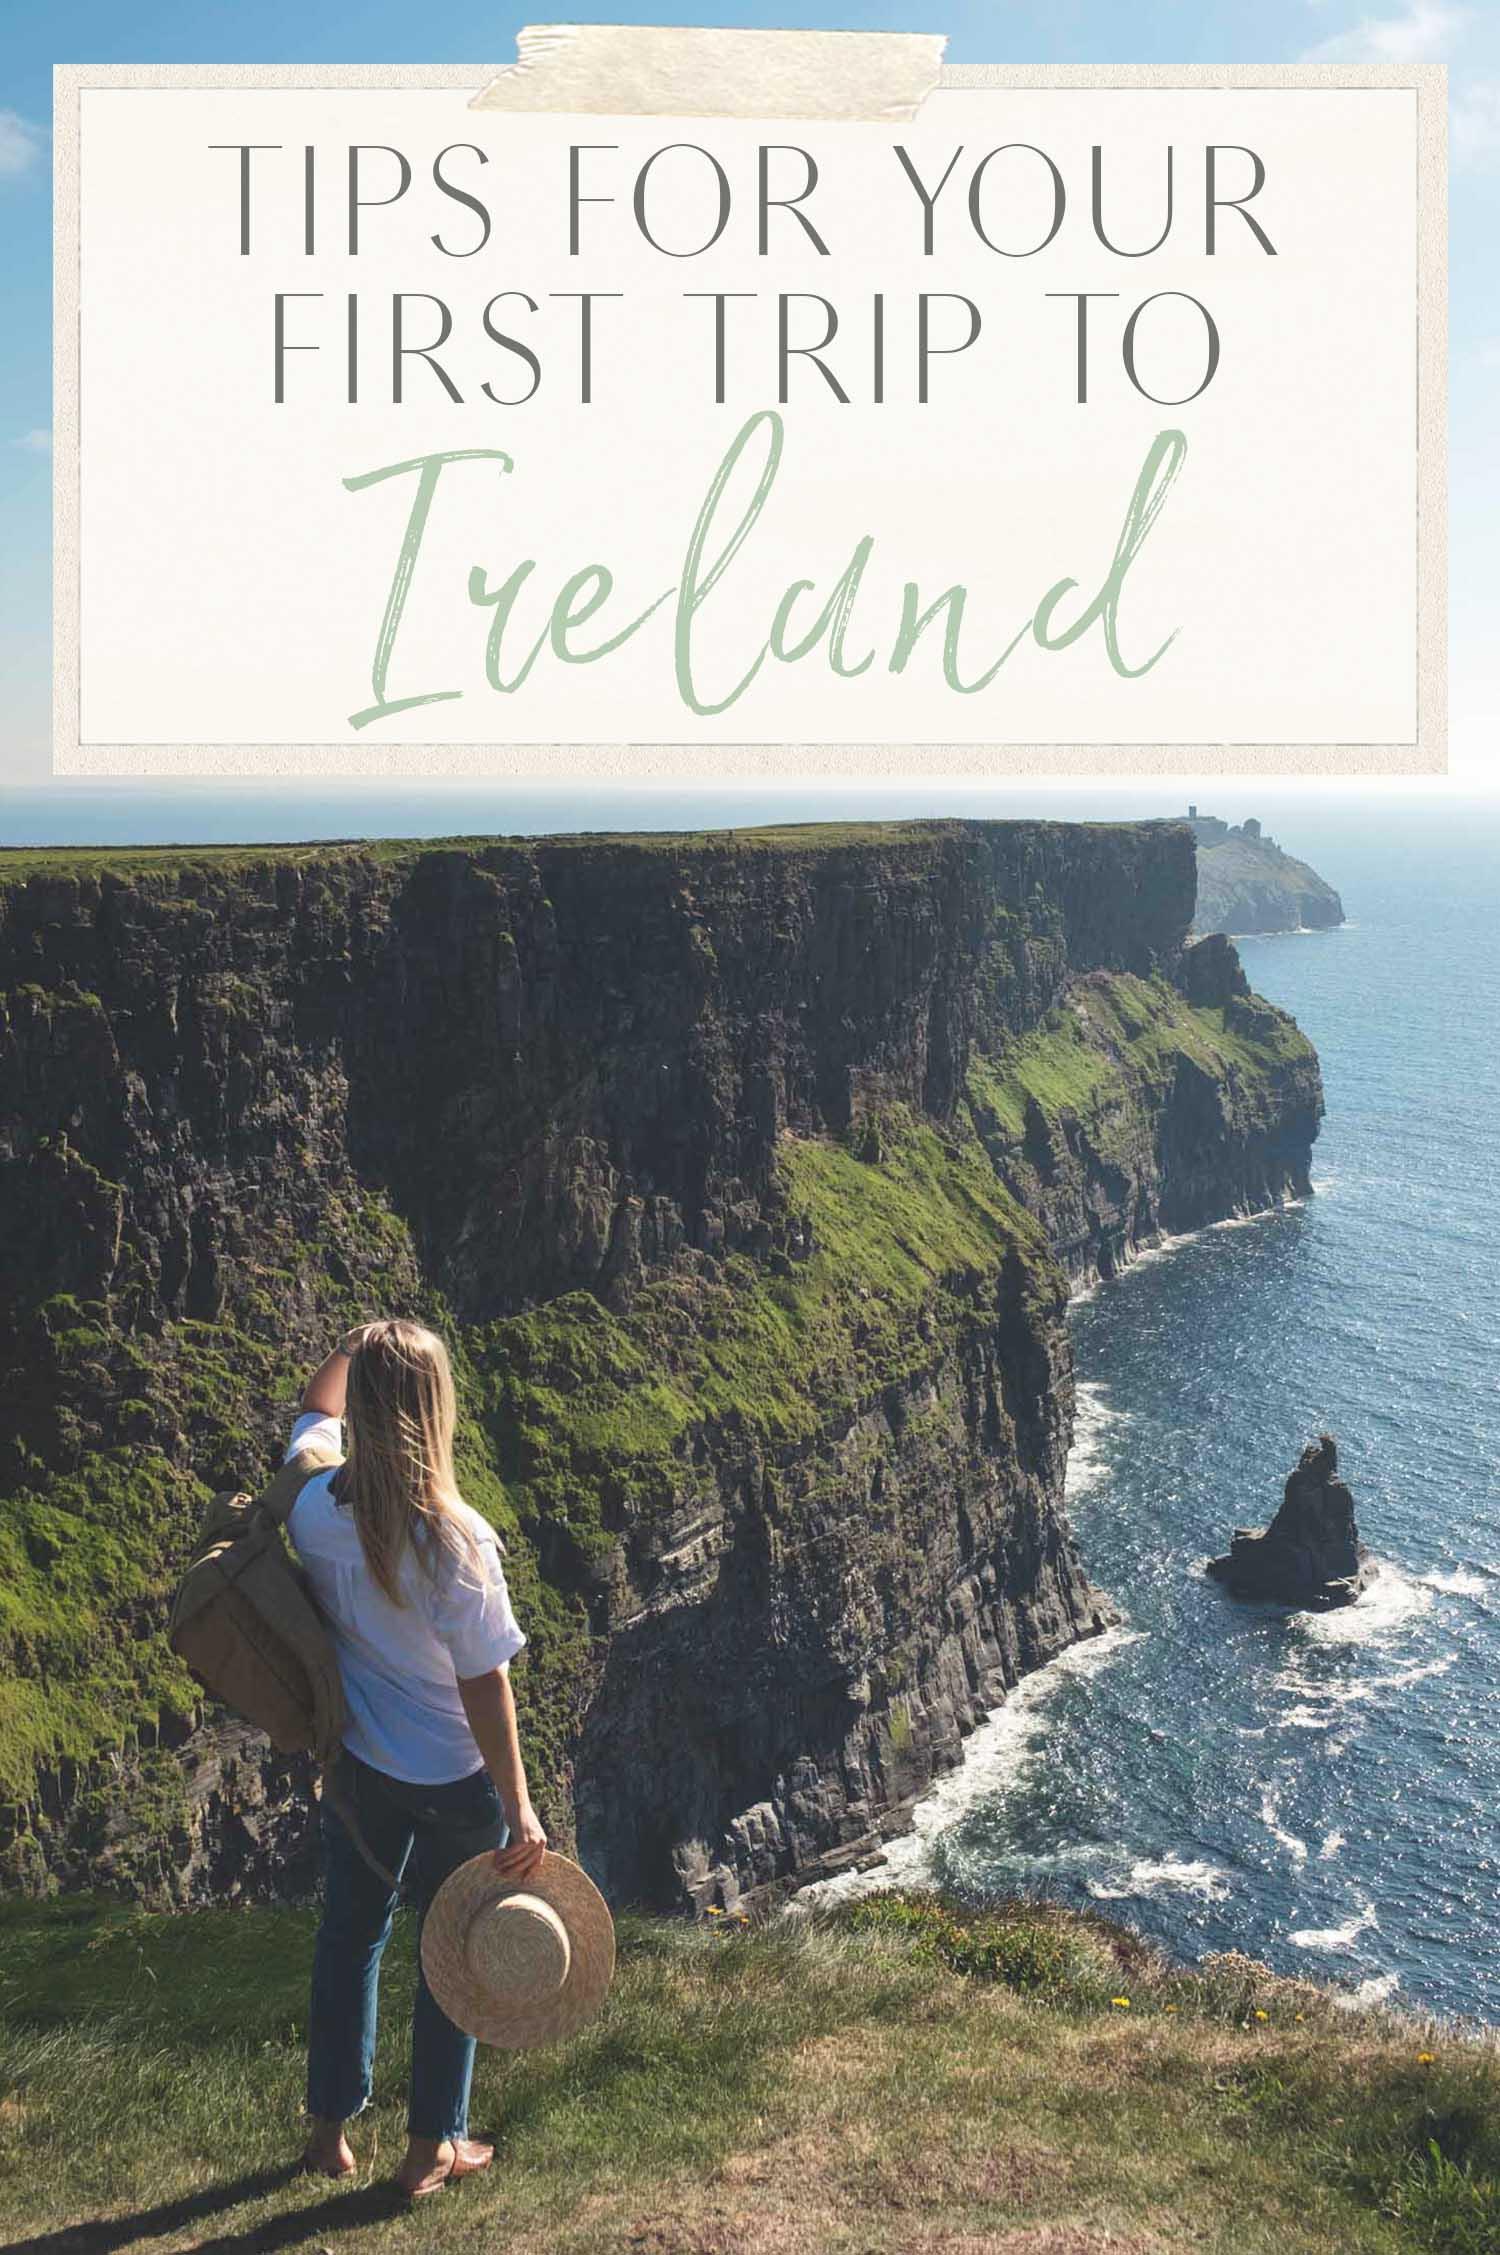 Tips-for-Visiting-Ireland-Header